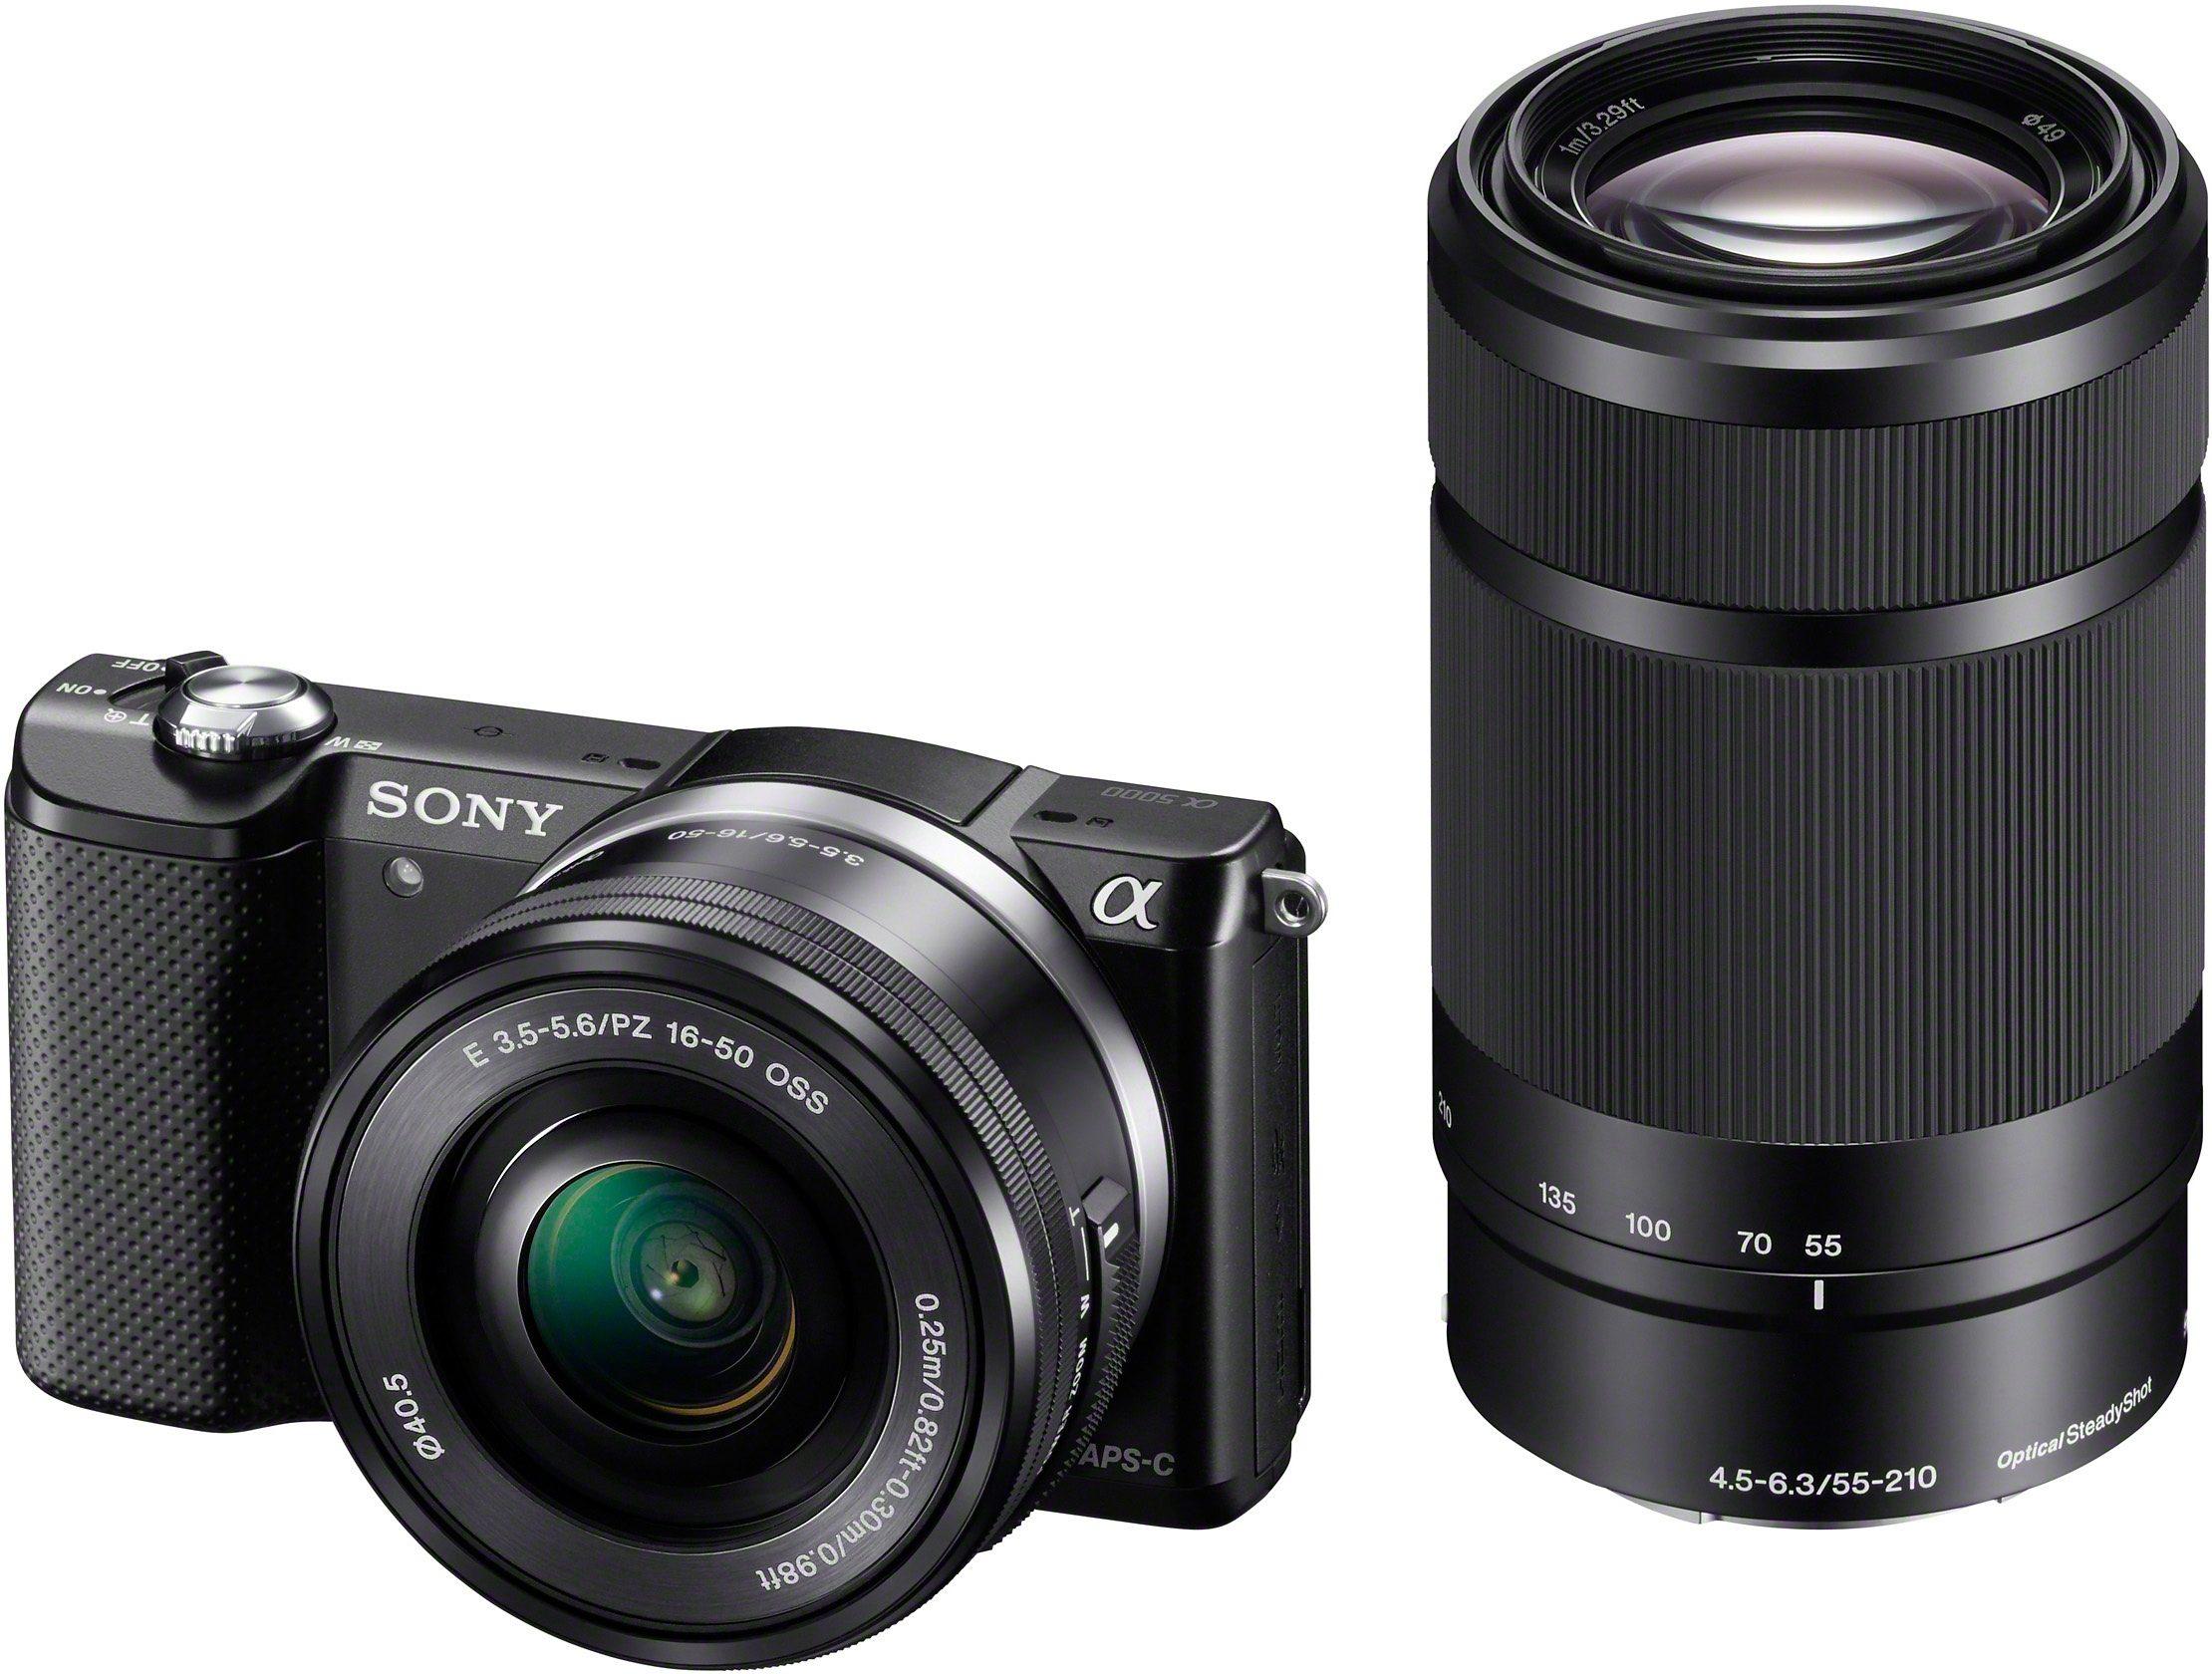 Sony Alpha ILCE-5000Y Set System Kamera, inkl. 2 SEL-Objektive (16-50mm & 55-210mm), 20,1 Megapixel